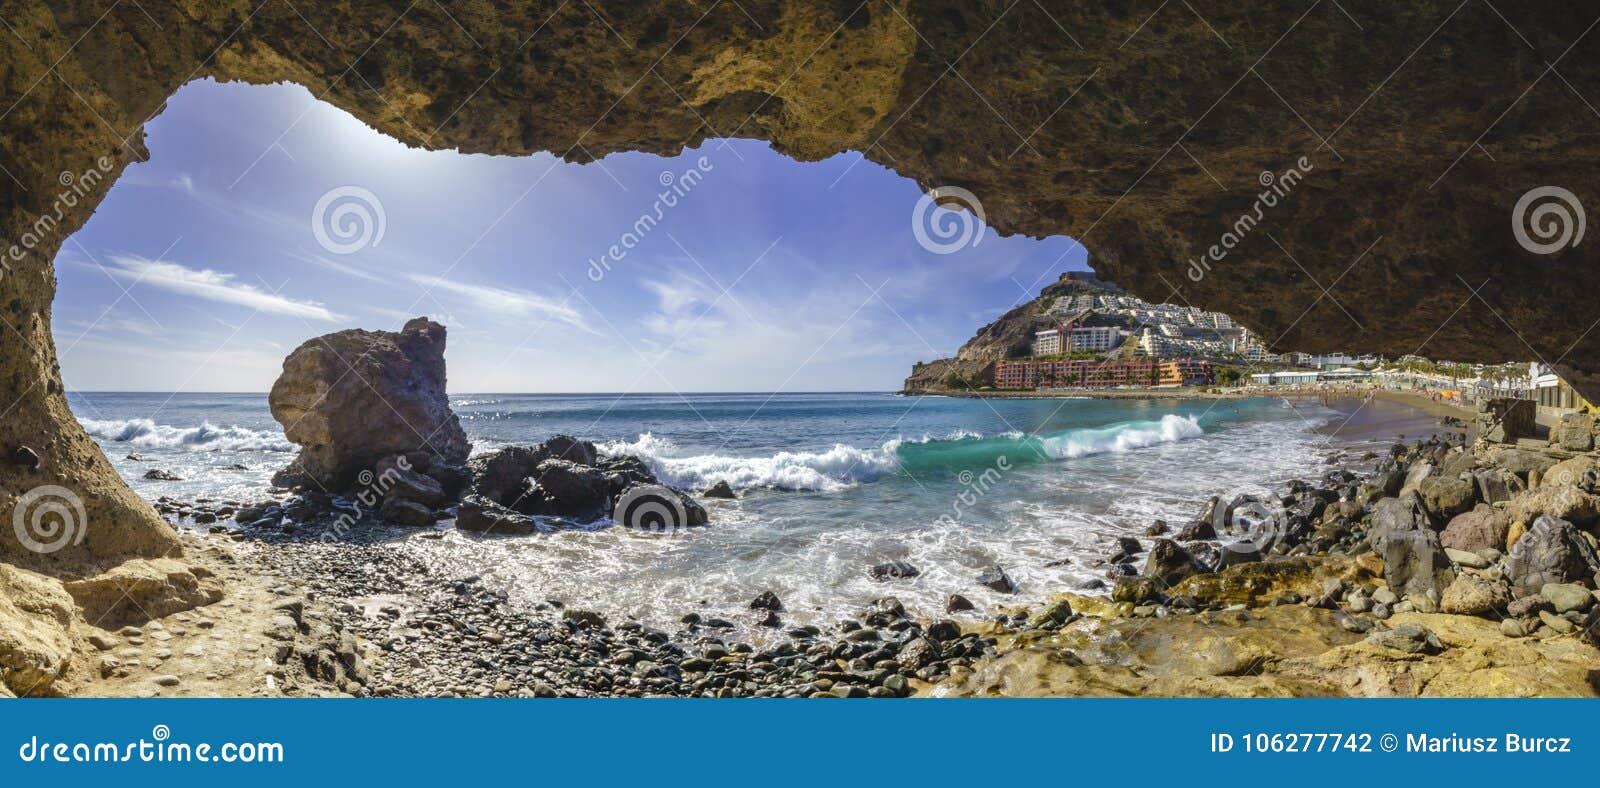 Gruta natural da rocha na praia em Playa del Cura, perto do playa A